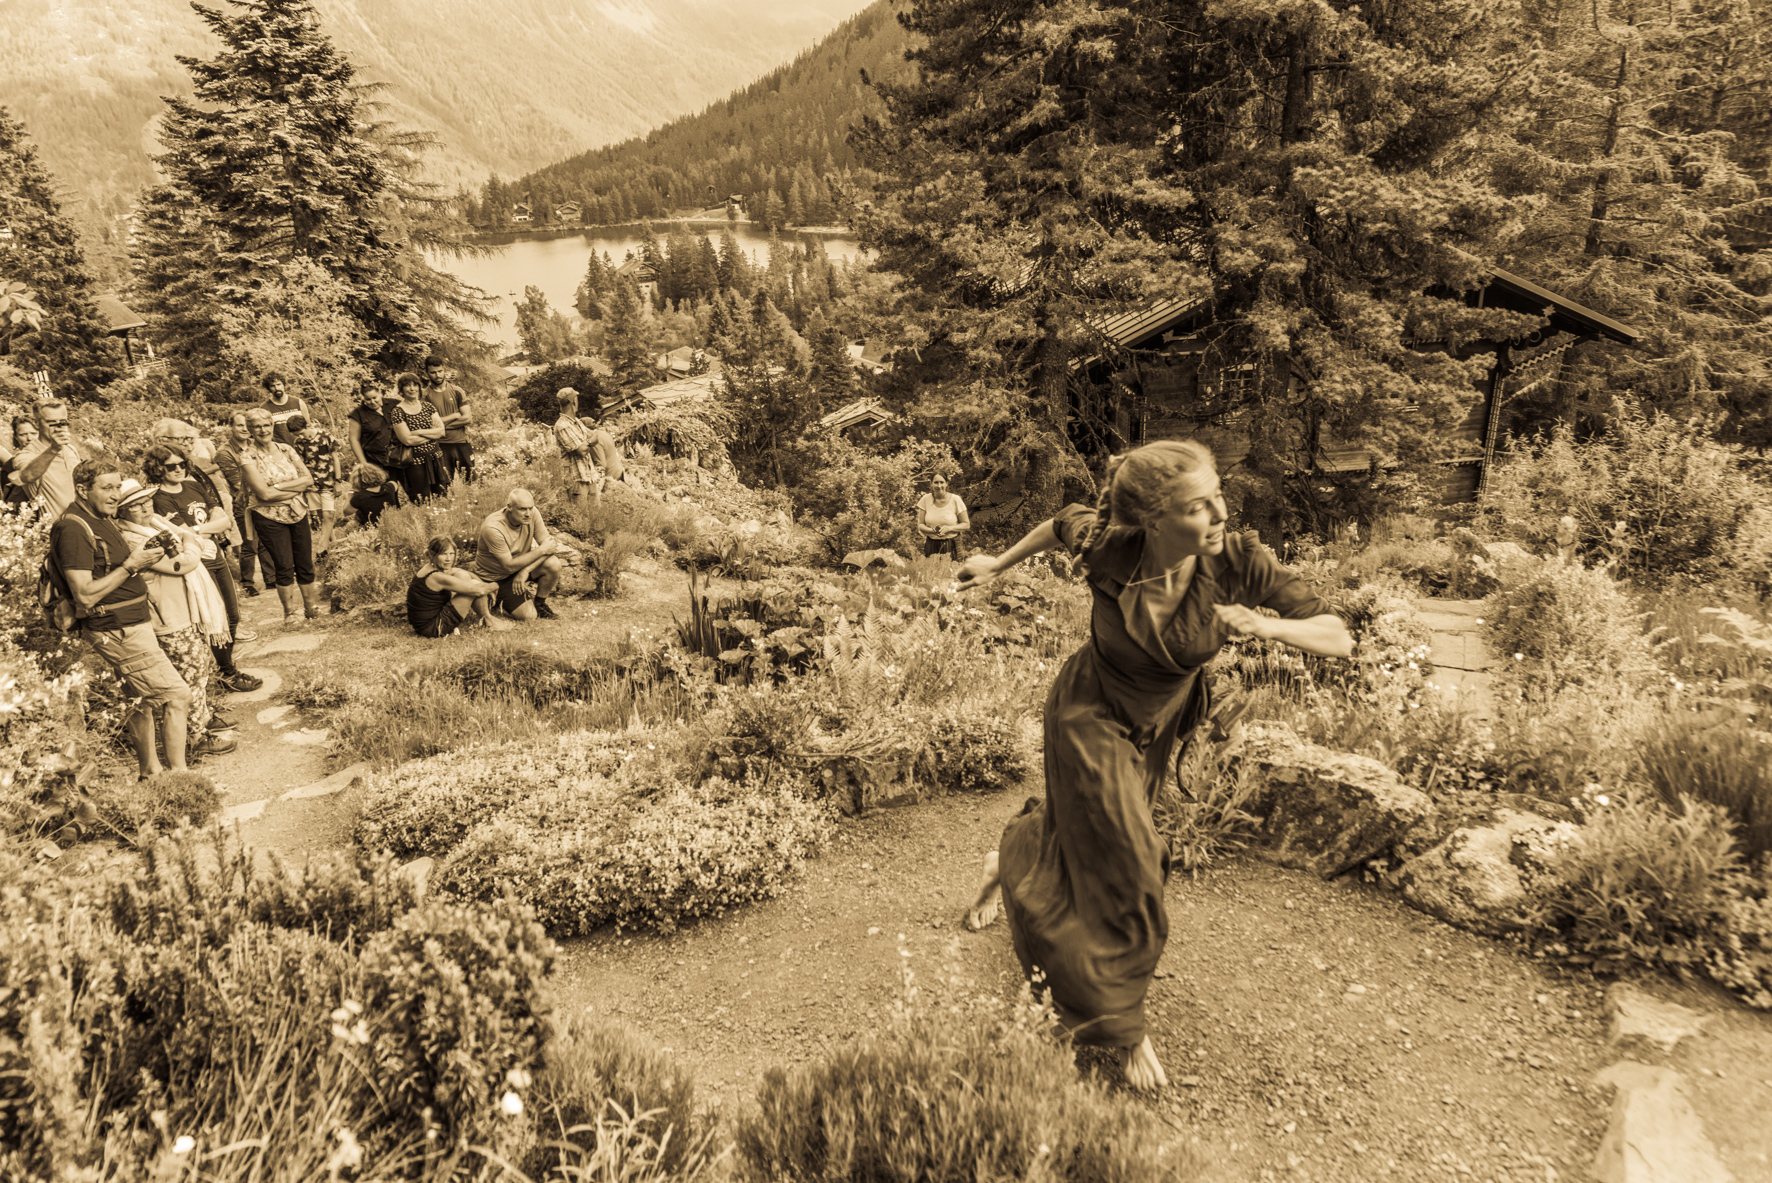 19062021-Flore-Alpe-30249